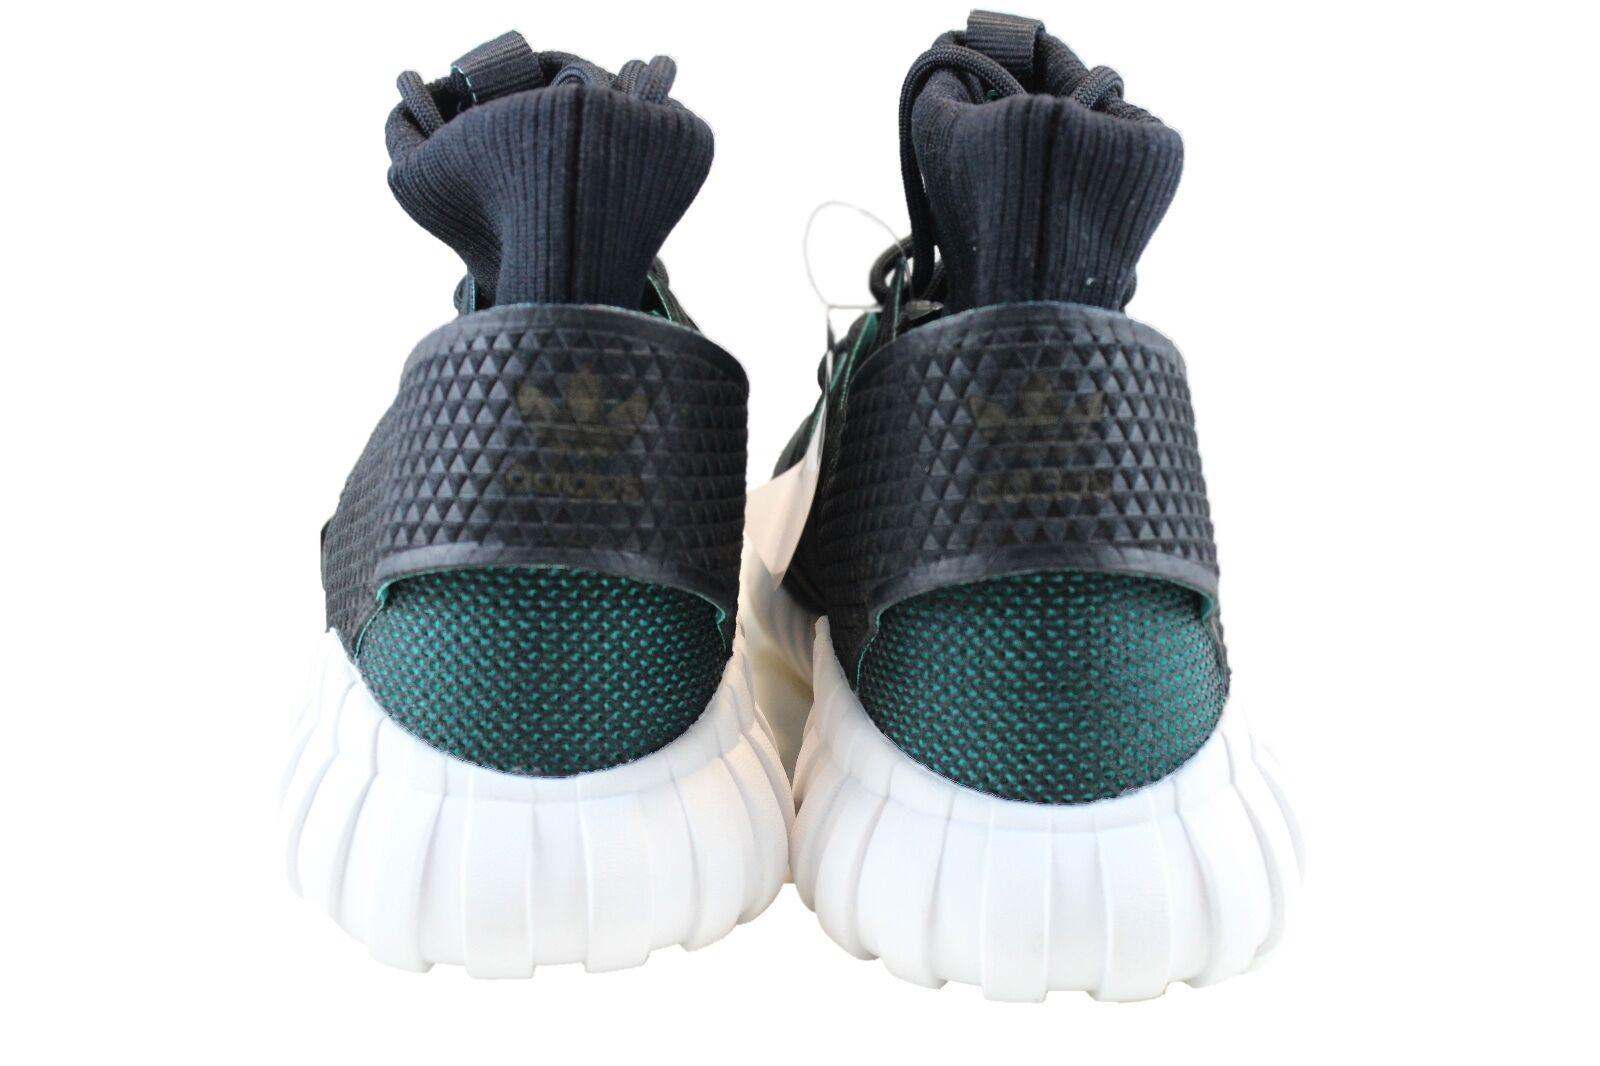 Adidas Adidas Adidas tubuläre doom